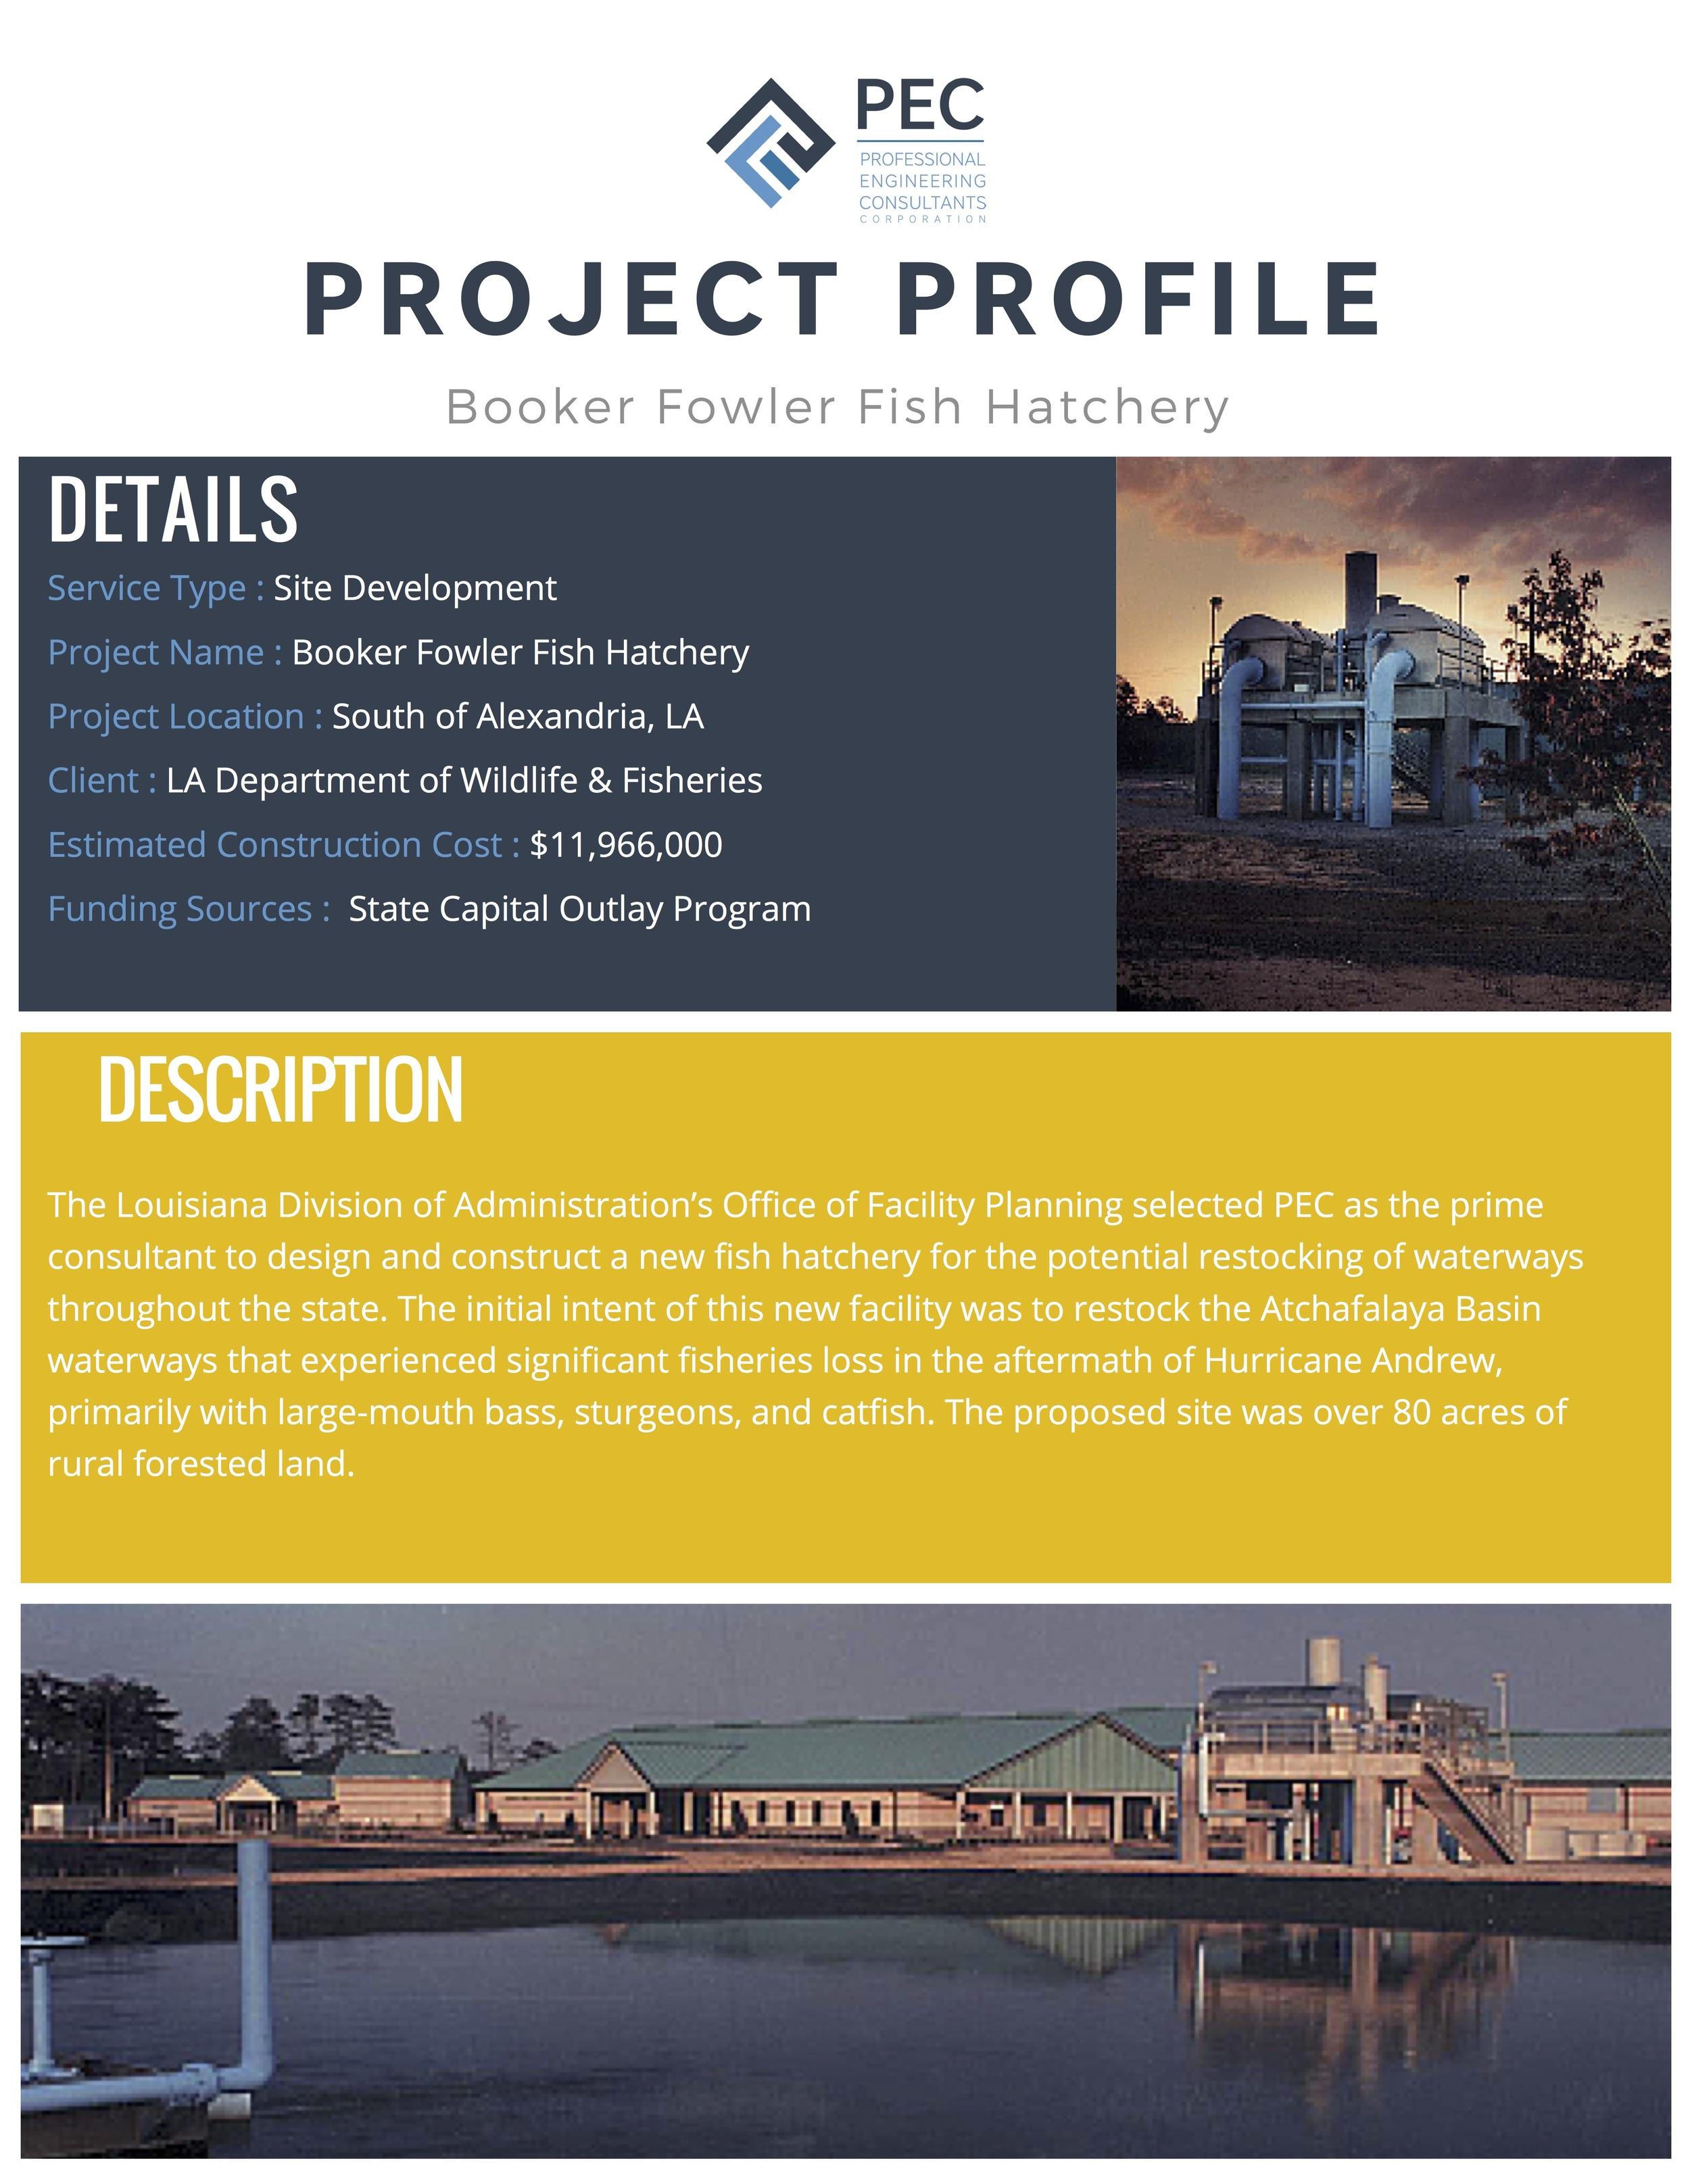 Project Profile_bookerfowlerfishhatcheryfinal.jpg